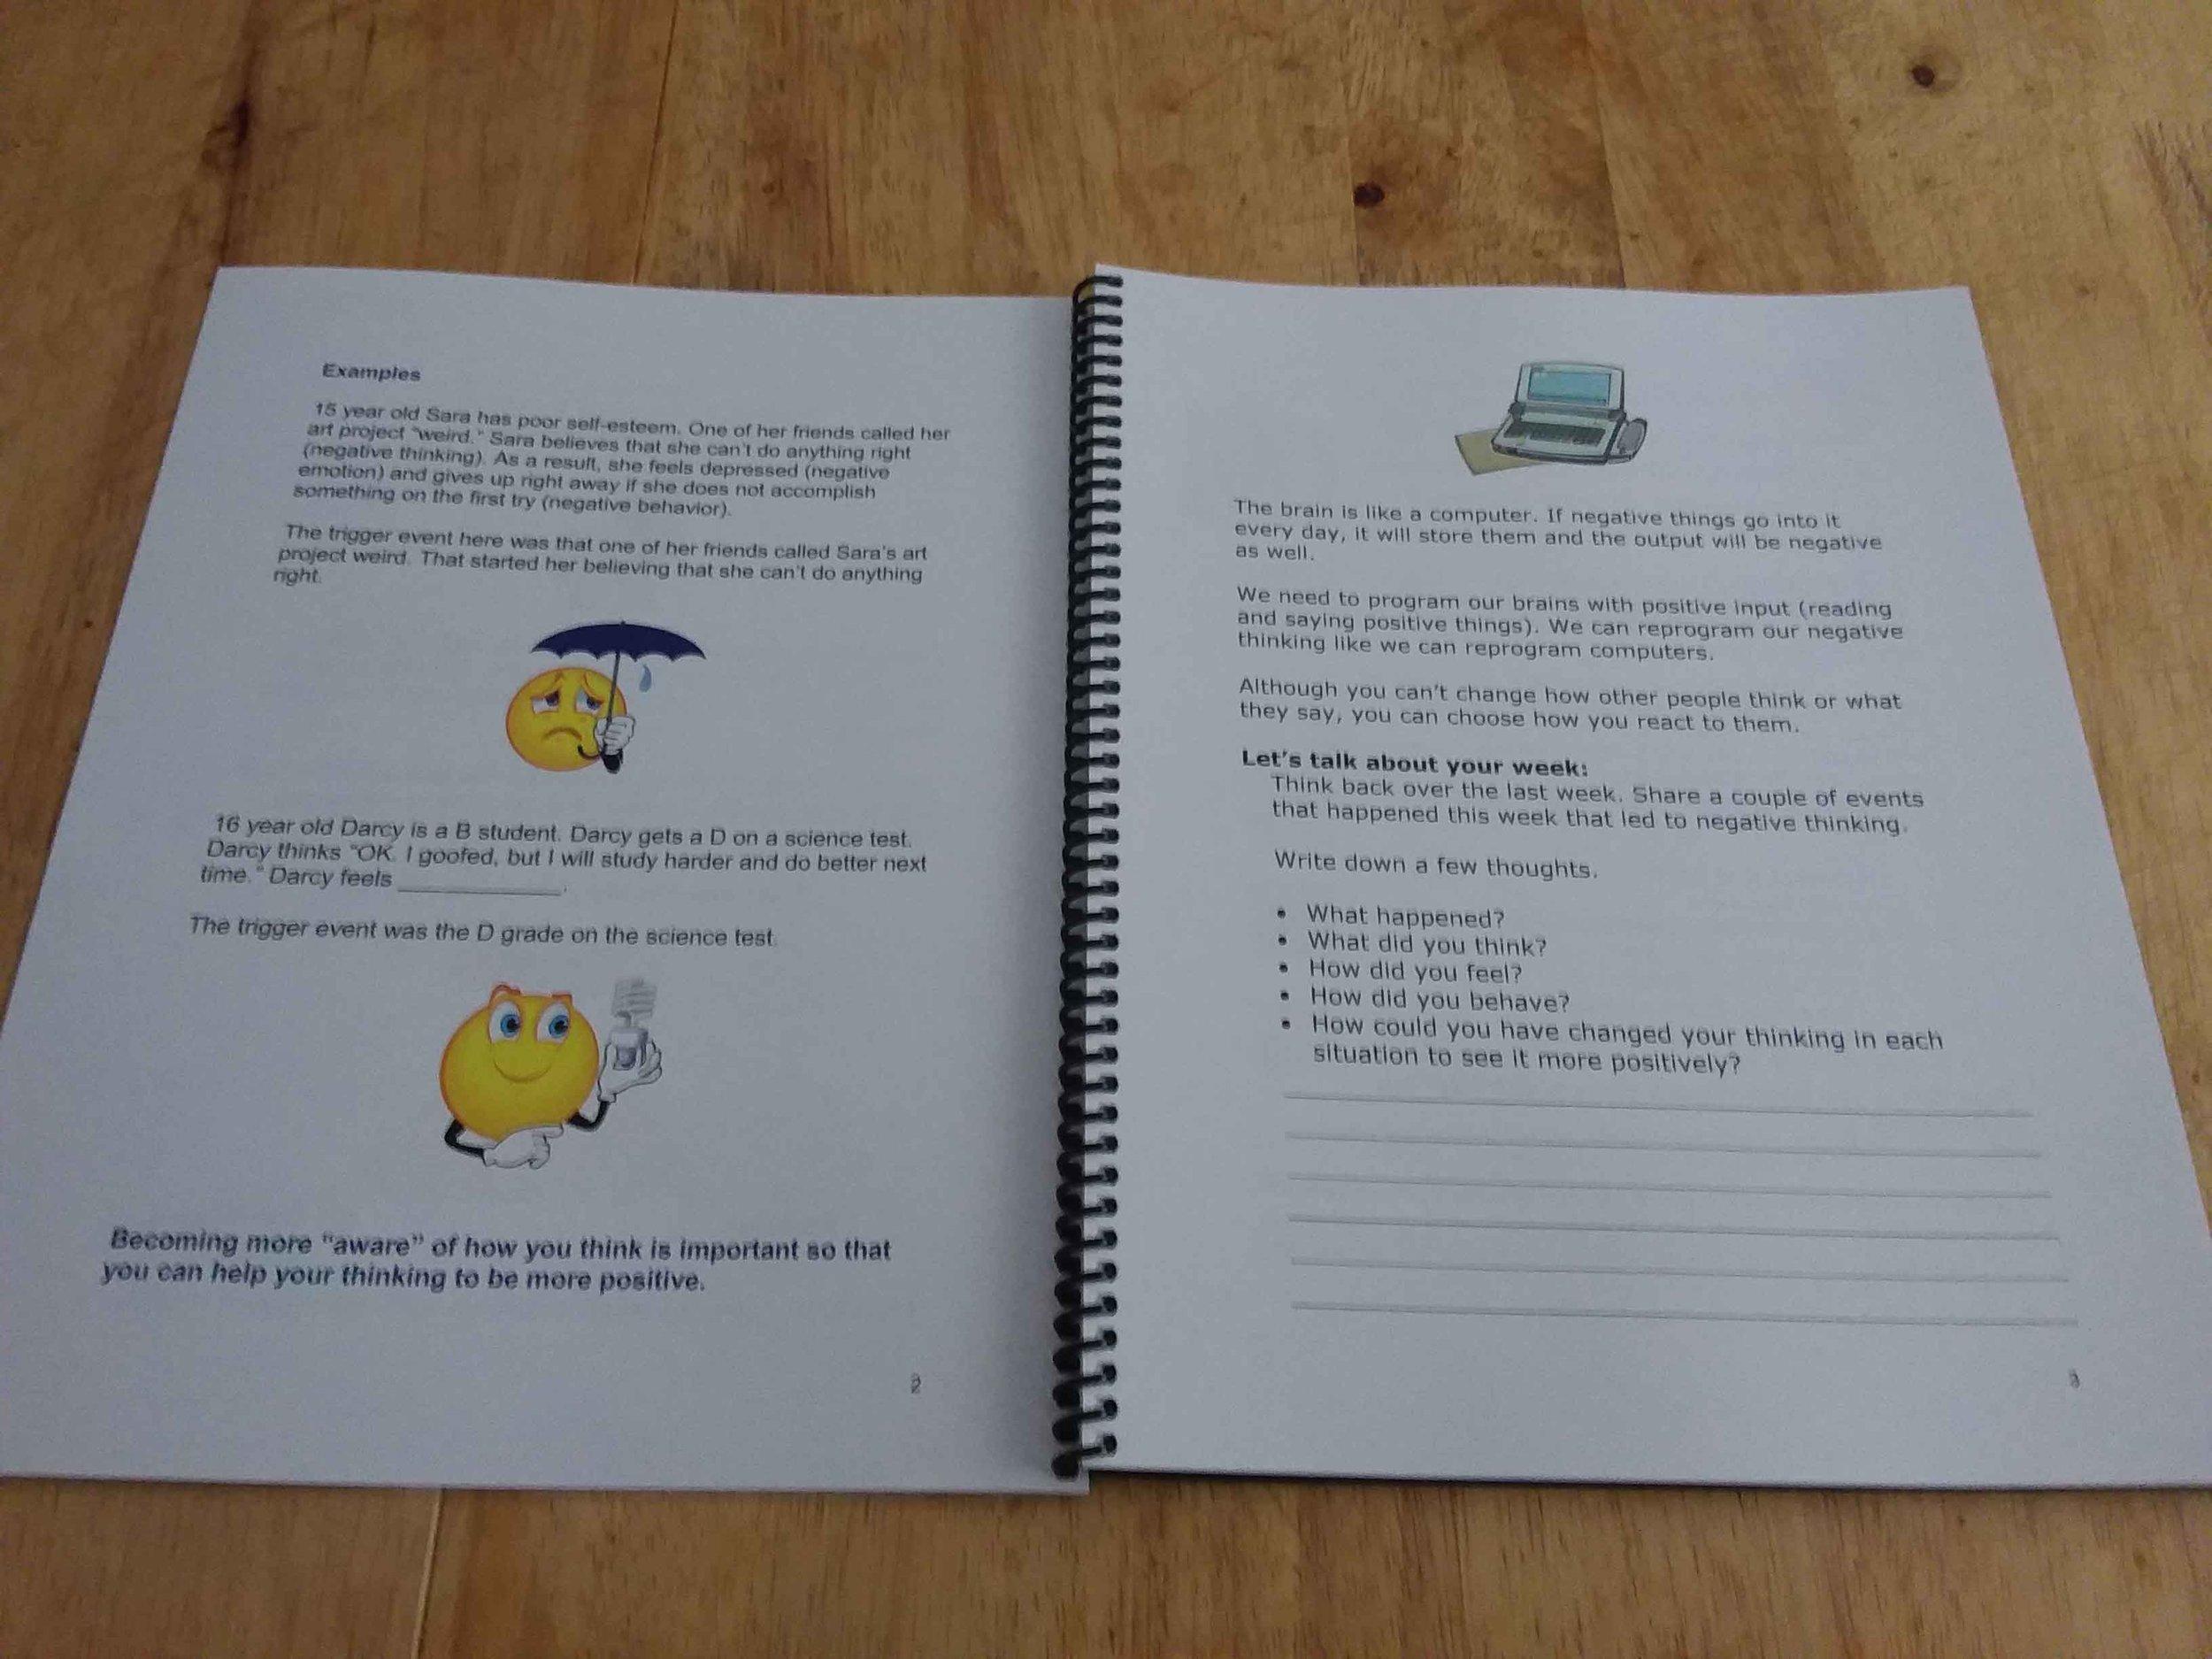 COPE Student Manual/Workbook